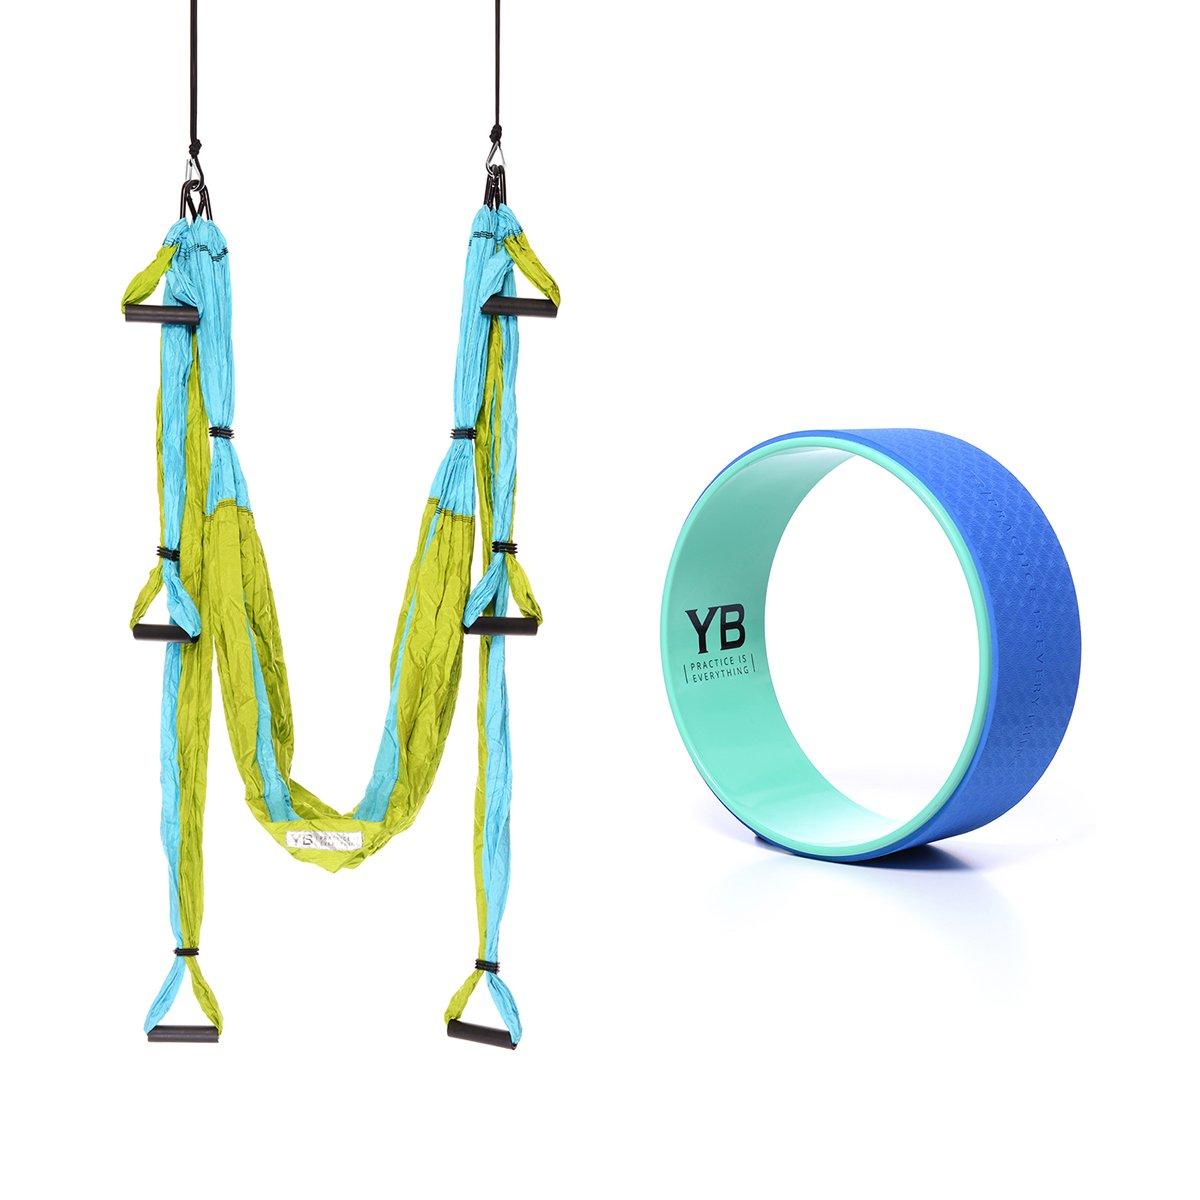 Bundle - 2 Items: Yoga Trapeze Blue & Yoga Wonder Wheel [Bundle] - Blue By YOGABODY - with 2 Free DVD